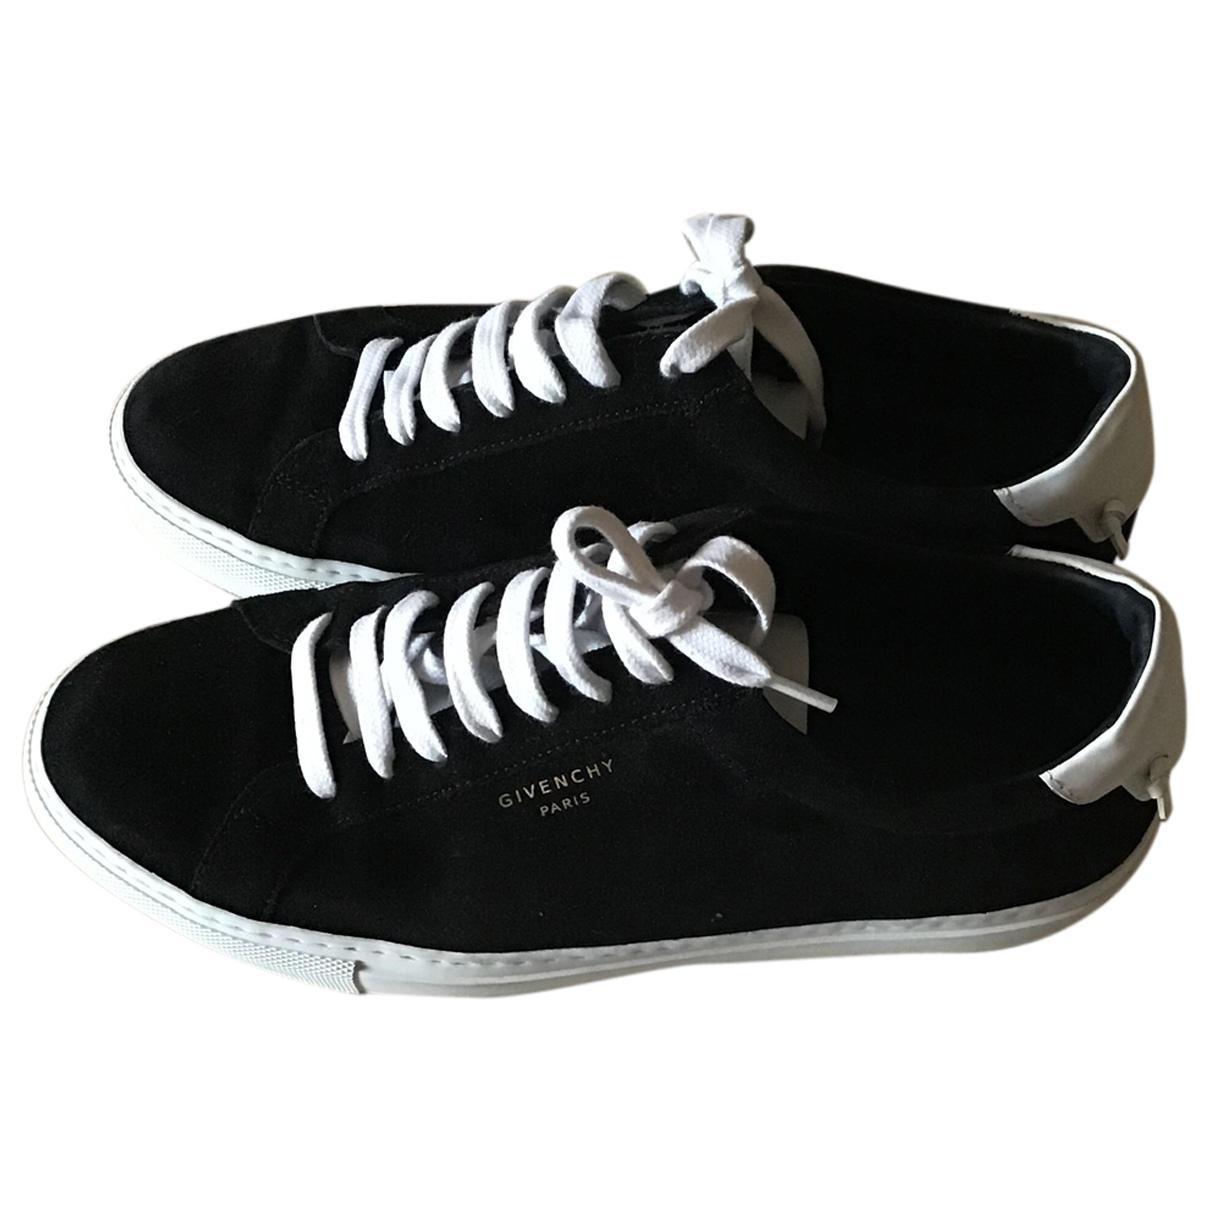 Givenchy \N Sneakers in  Schwarz Veloursleder